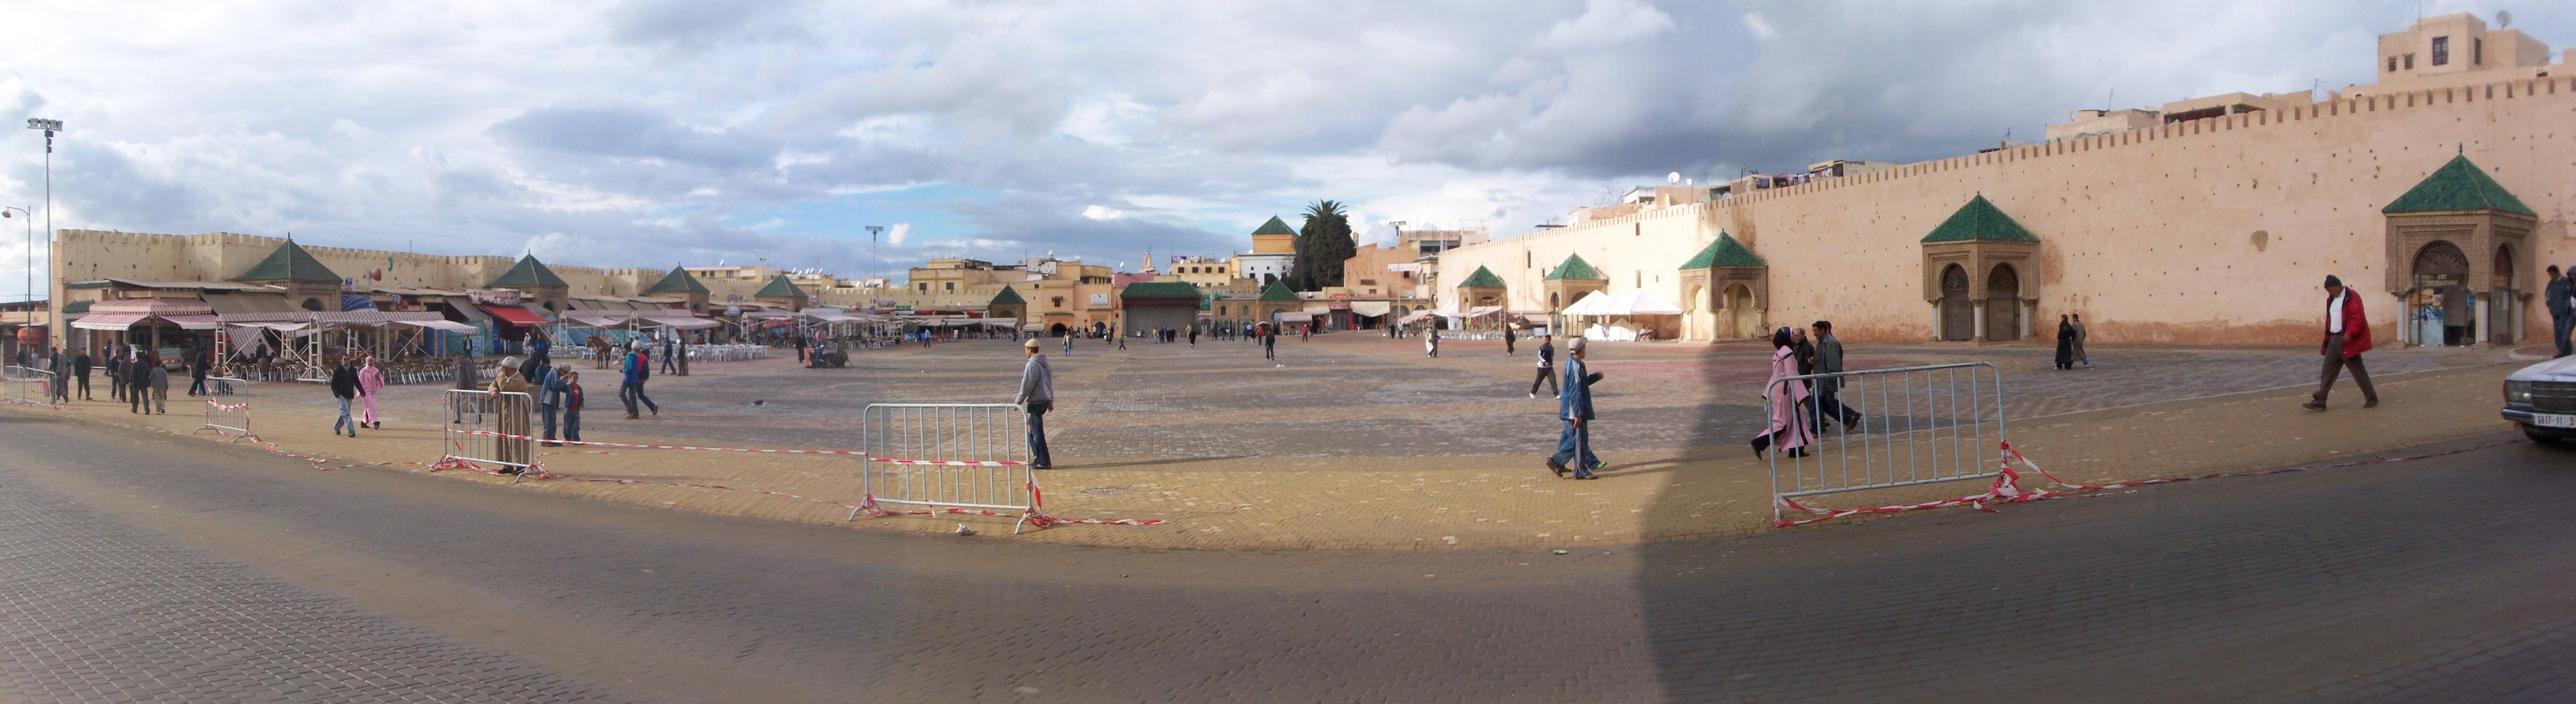 Meknès place El-Hedim